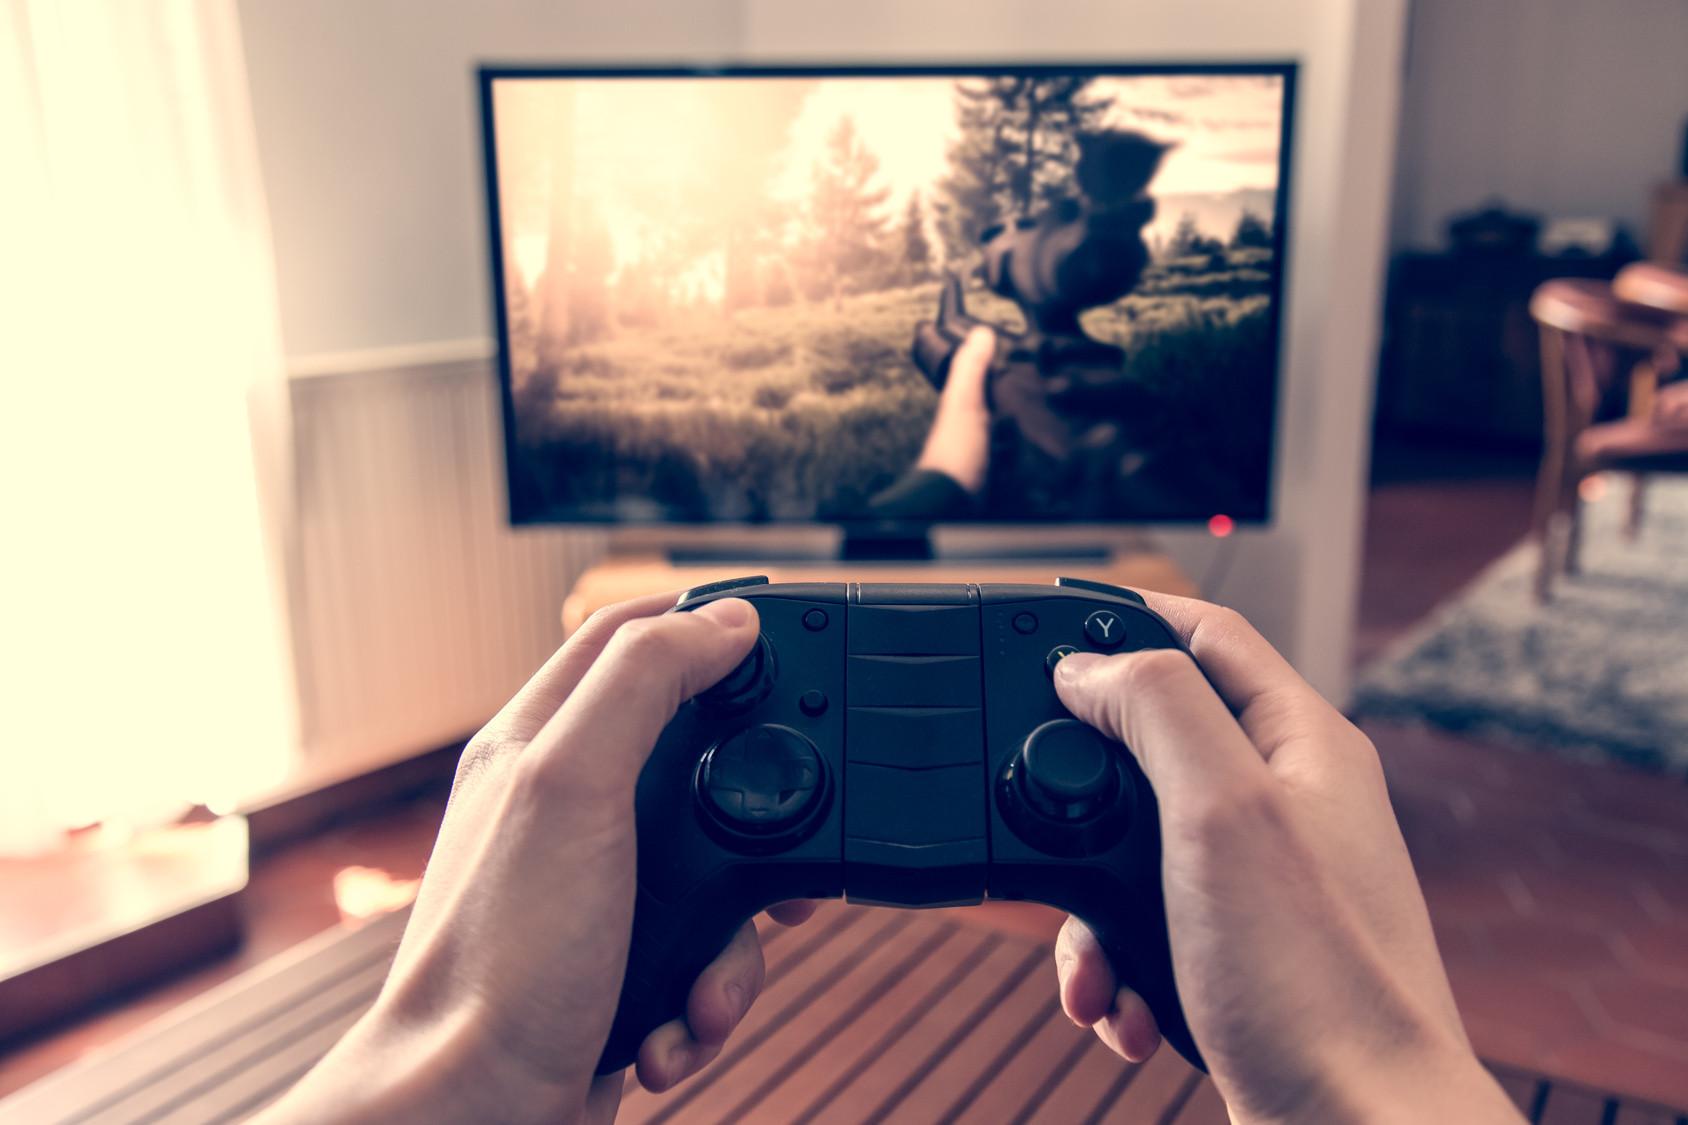 fotolia jeu vidéo fps console